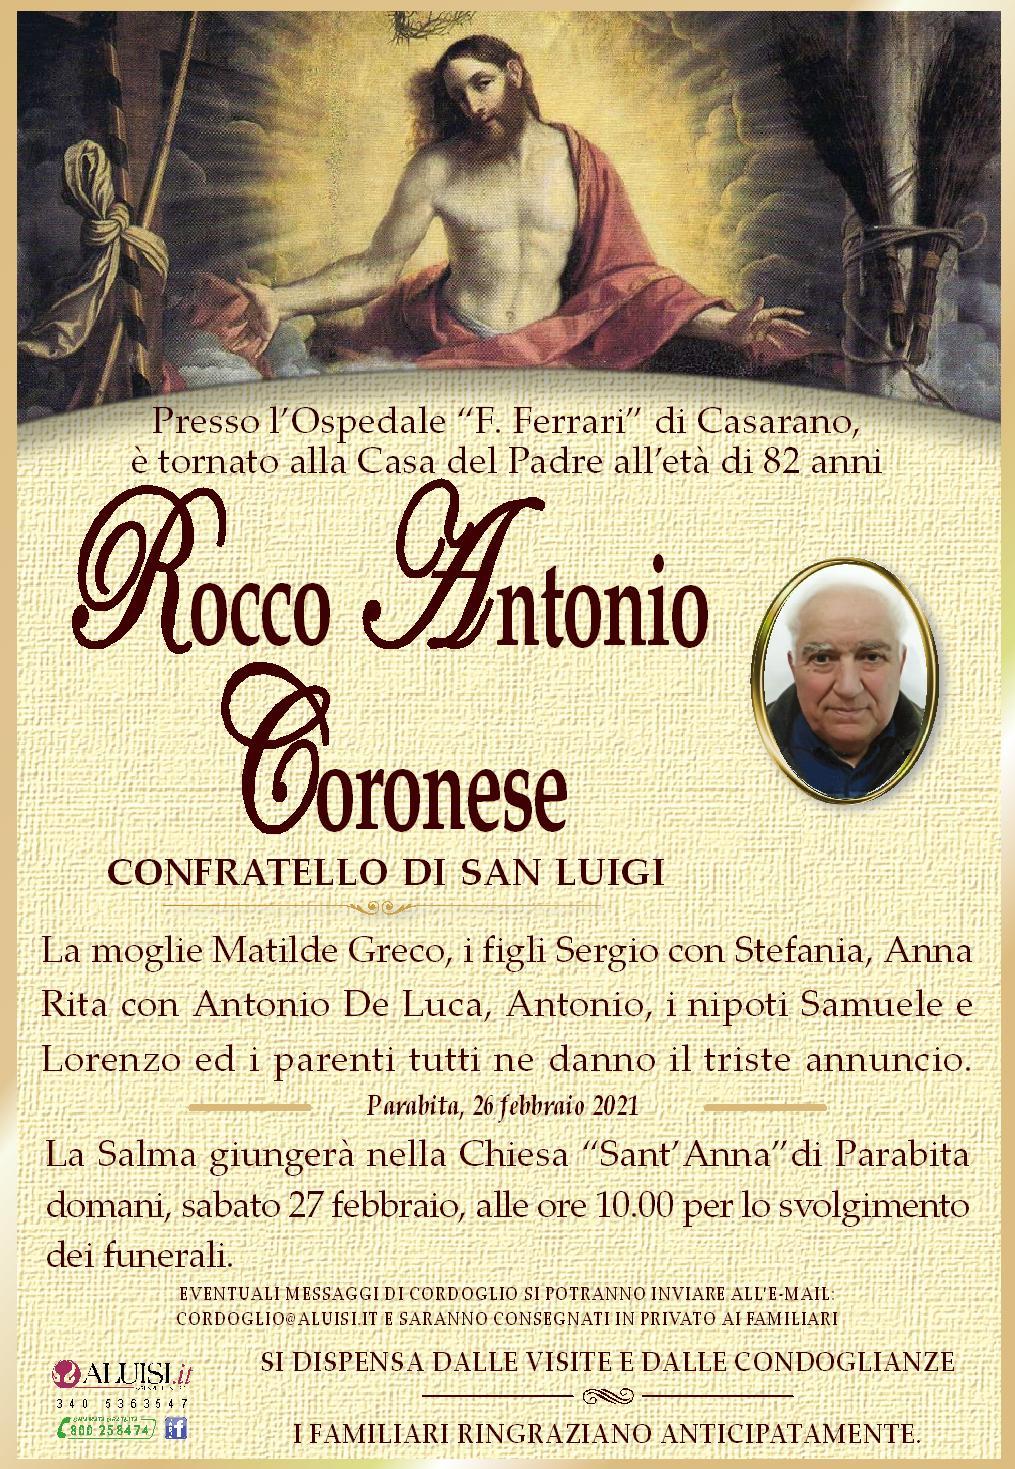 Annuncio-ROCCO-ANTONIO-CORONESE-PARABITApiccolo.jpg